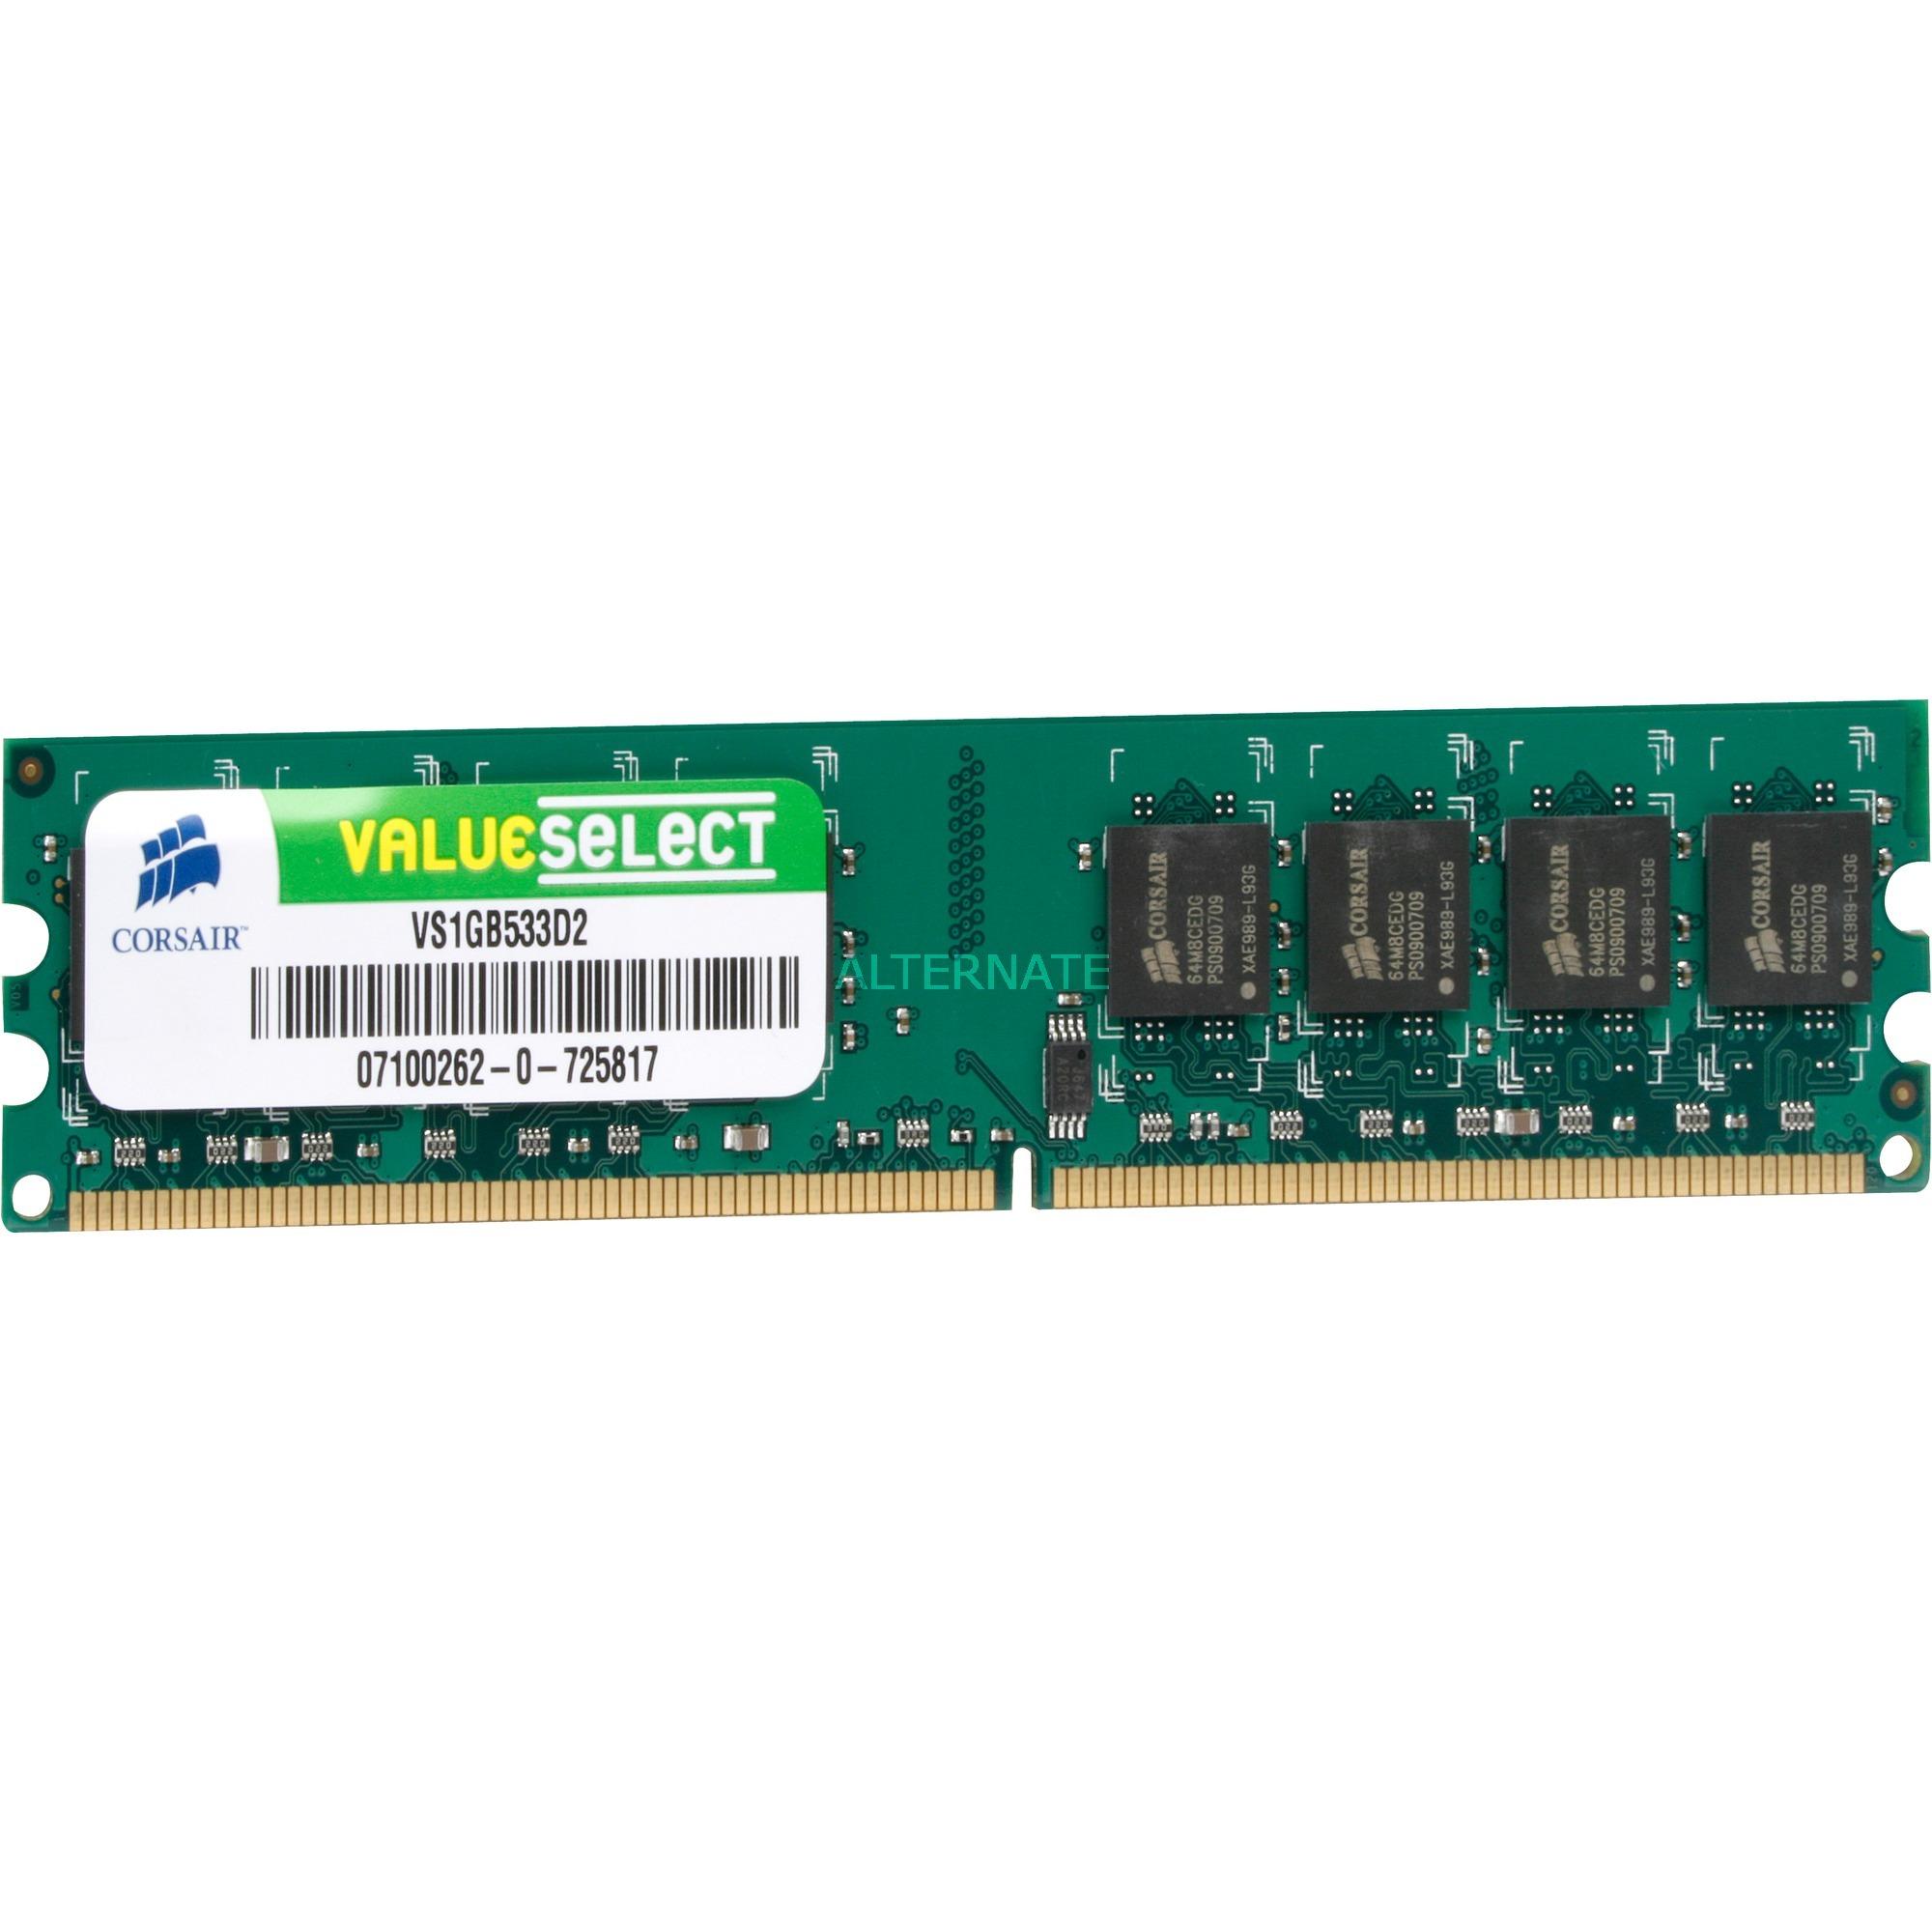 1GB DDR2 SDRAM DIMM módulo de memoria 533 MHz, Memoria RAM